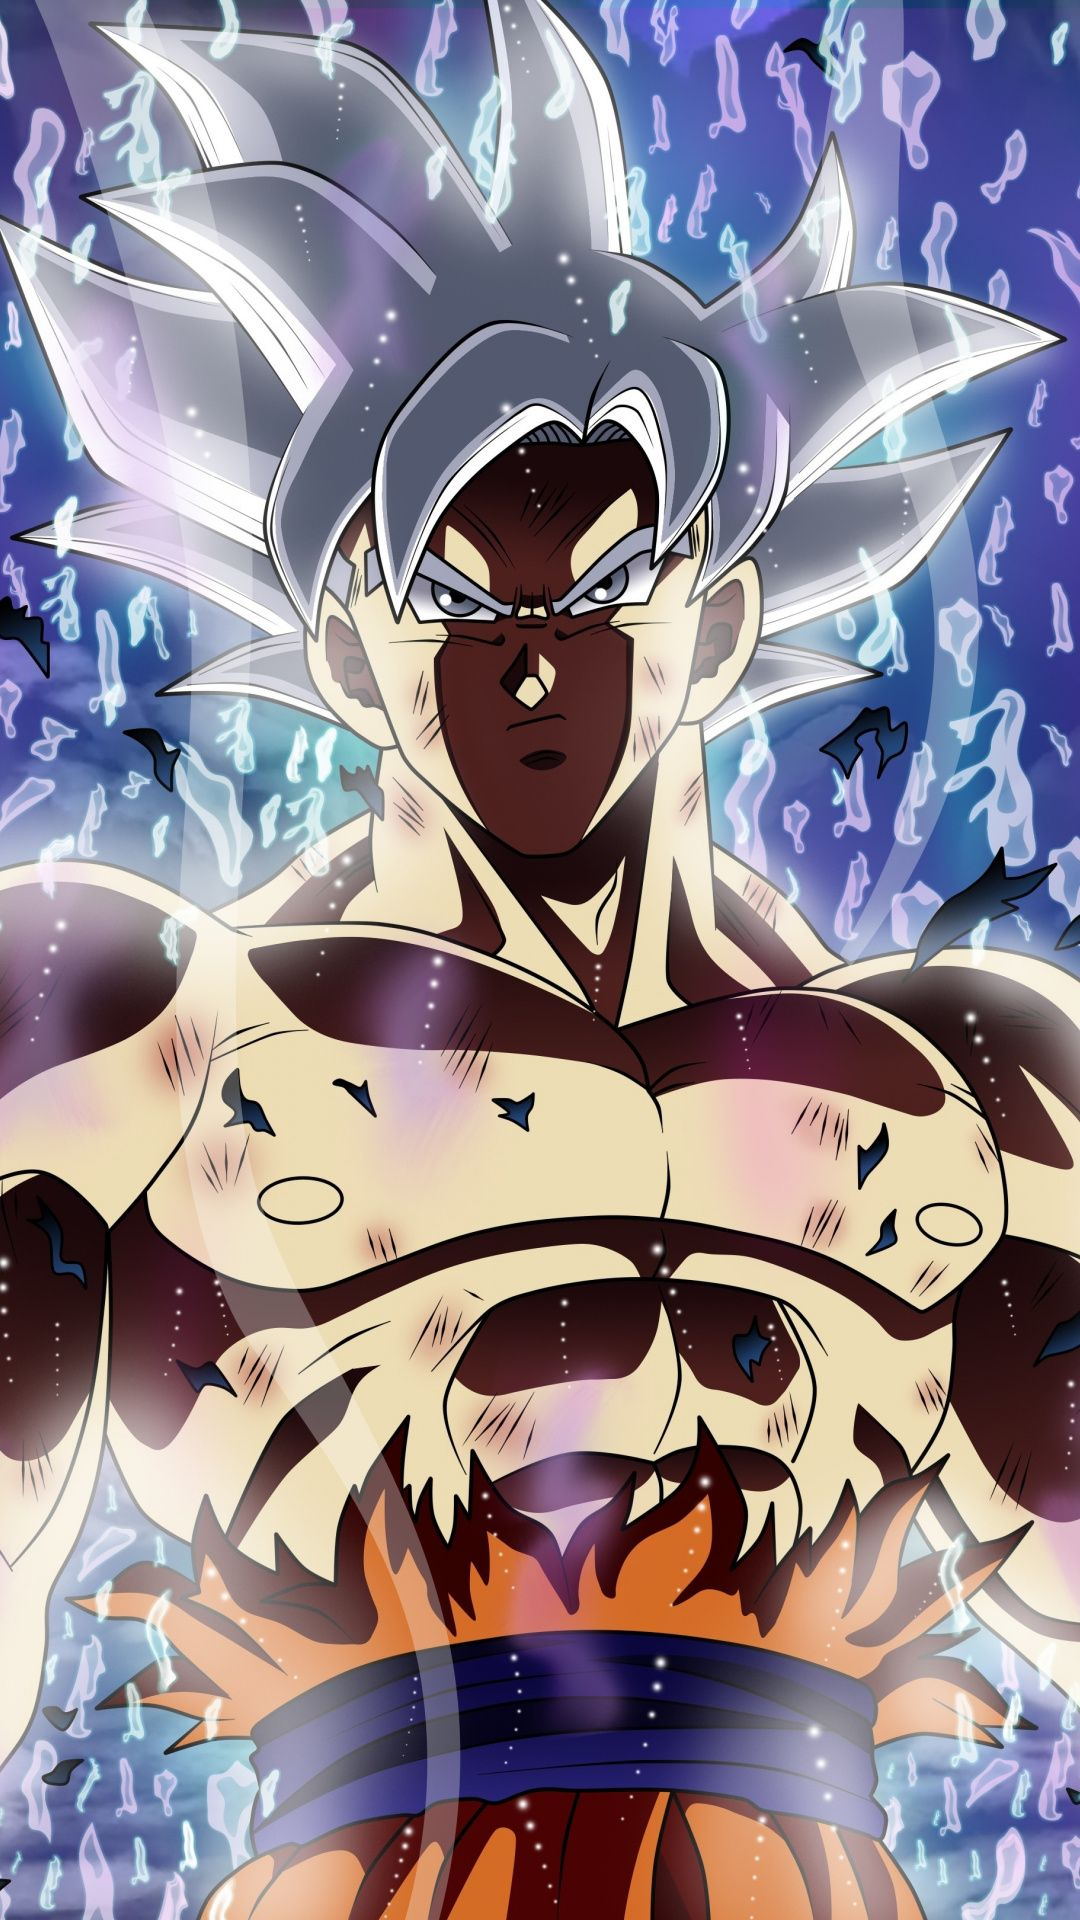 Dbz Ultra Instinct Hd Wallpaper Android Anime Dragon Ball Super Anime Dragon Ball Dragon Ball